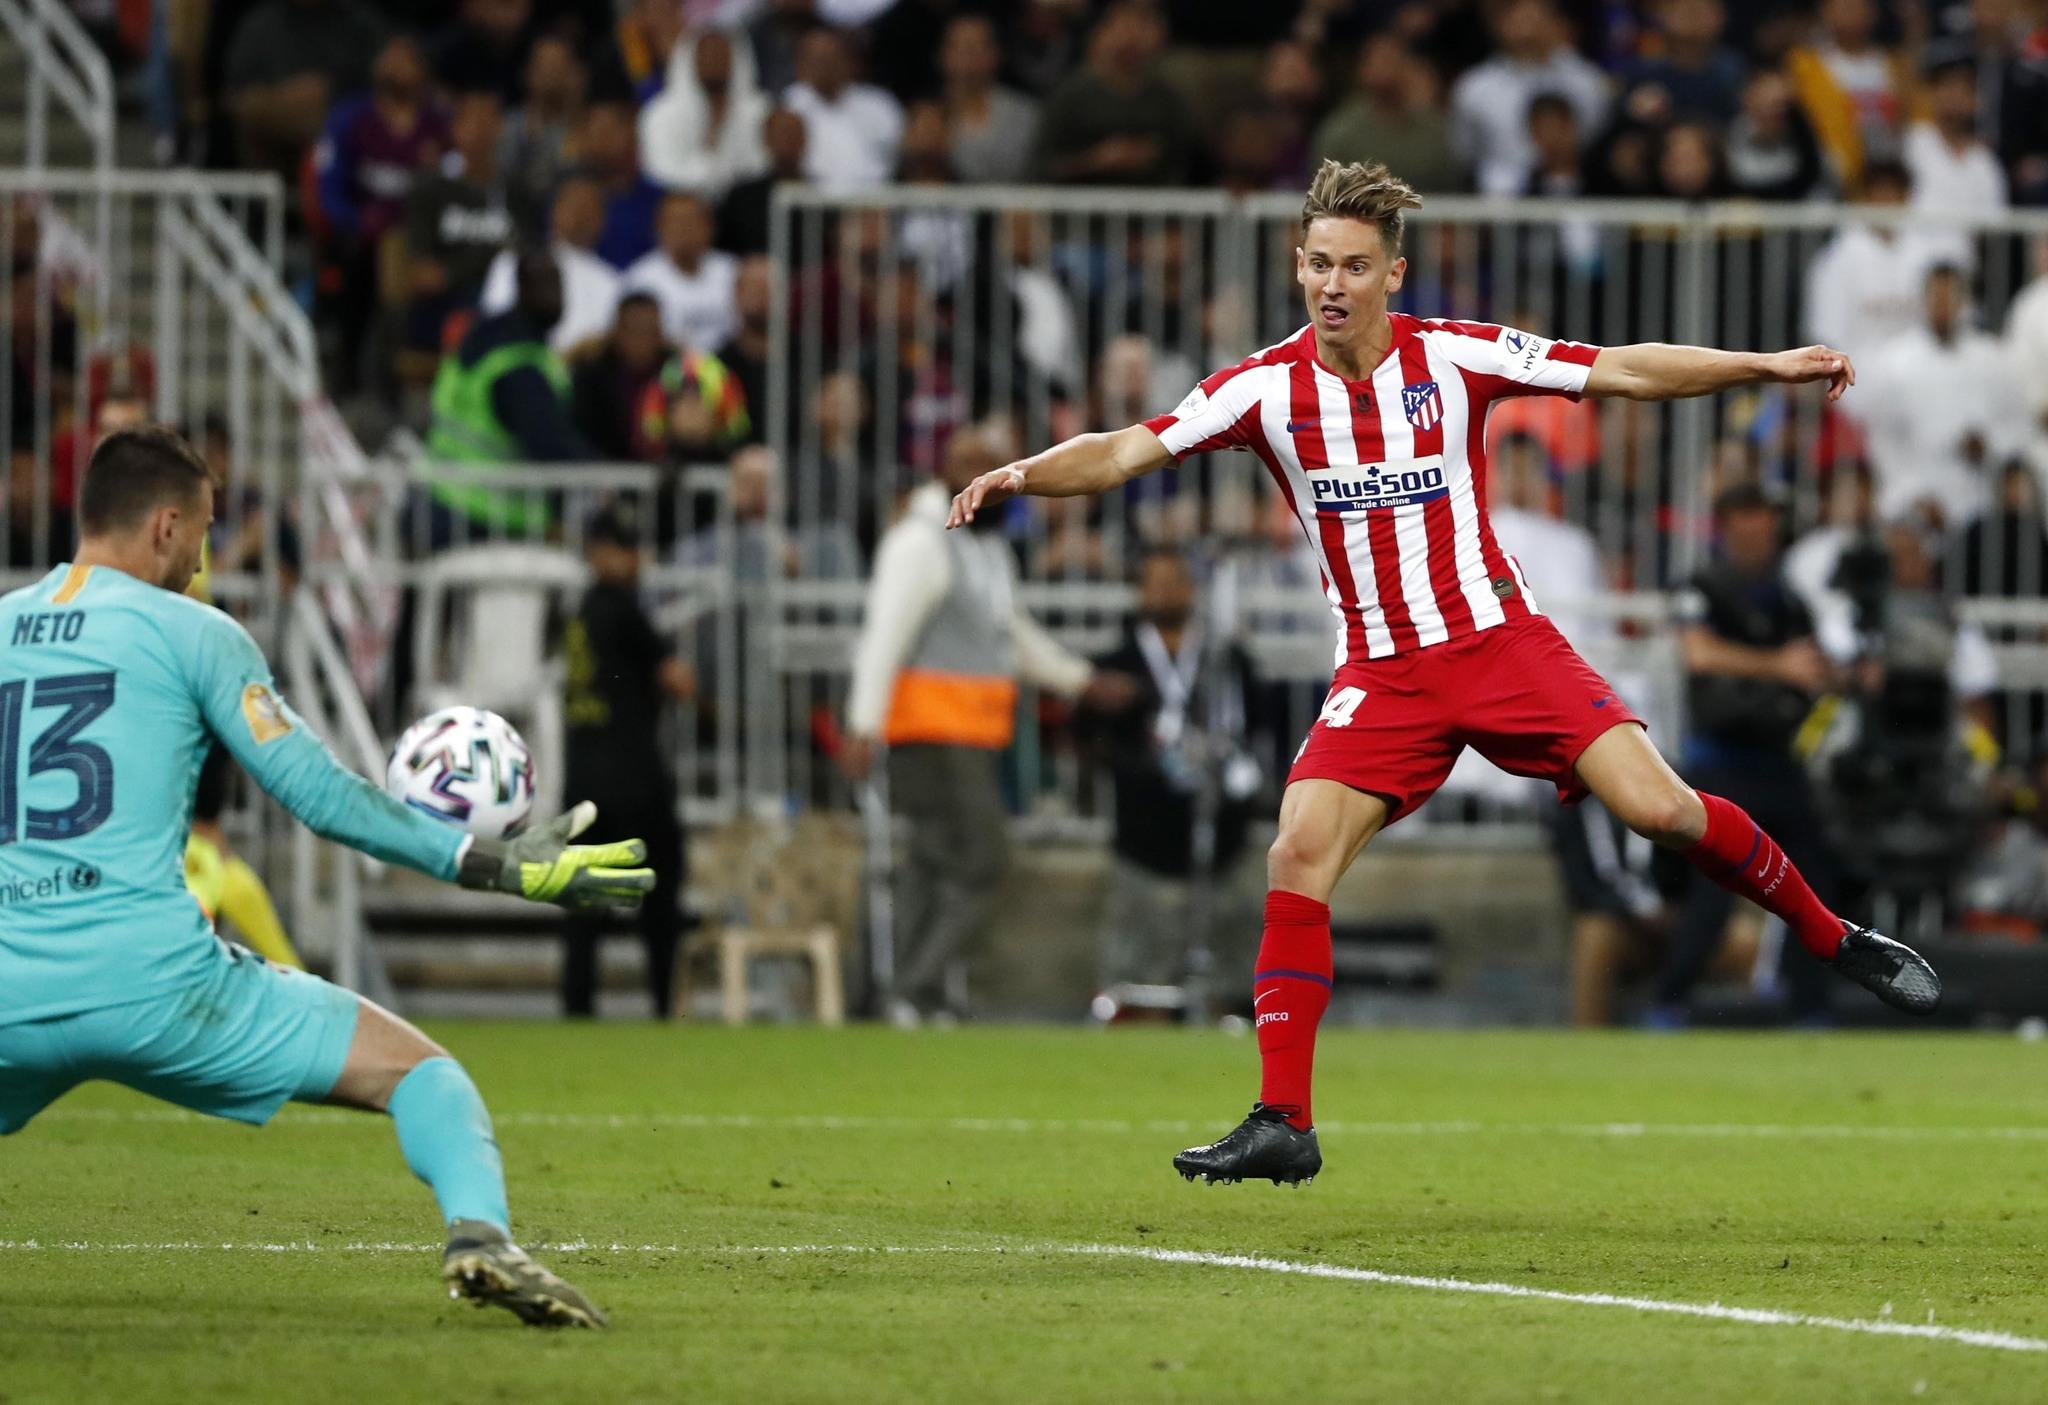 SEGUNDA SEMIFINAL SUPERCOPA DE ESPAÑA 2020 FC BARCELONA-ATLETICO DE MADRID